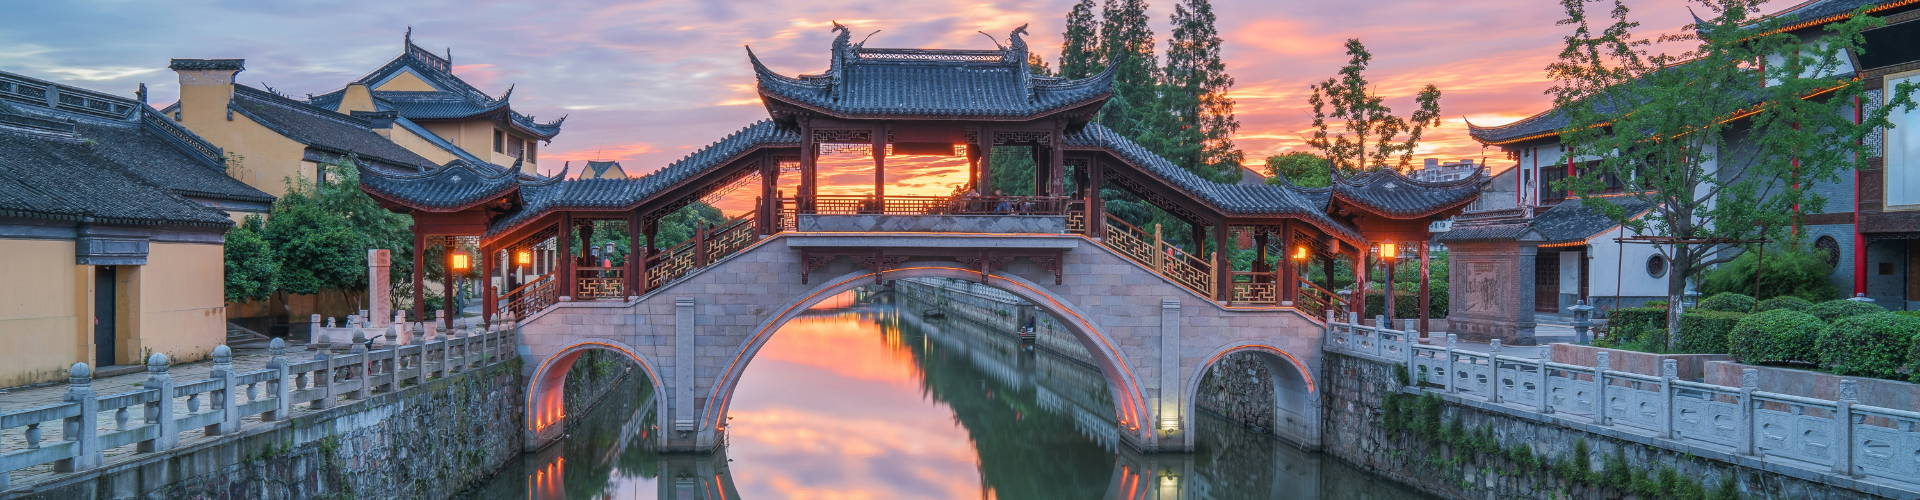 china incense culture